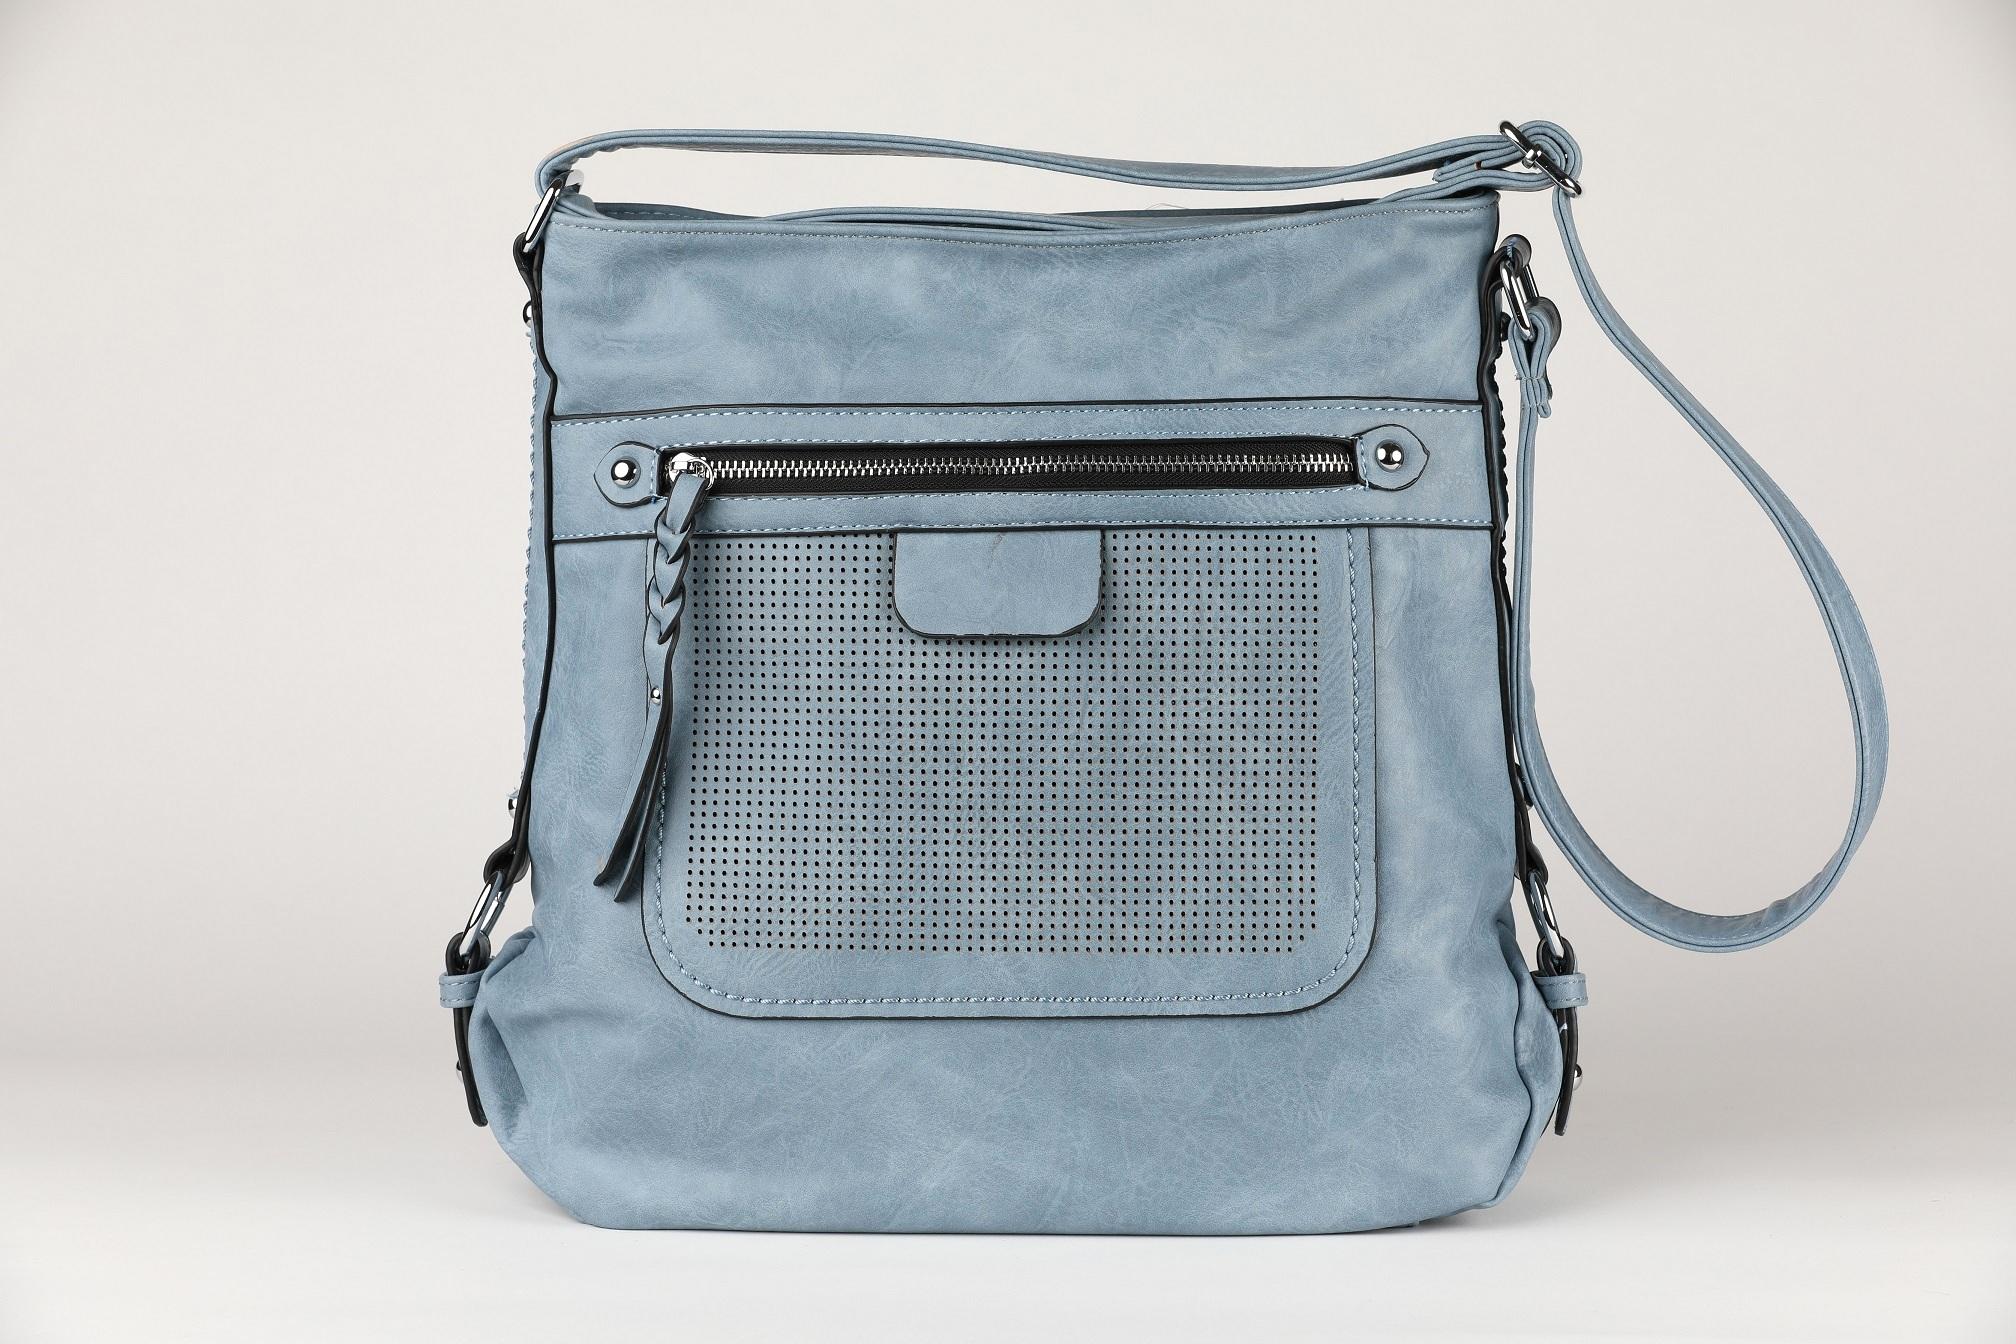 Crossbody kabelky ROMINA & CO H7225 modrá